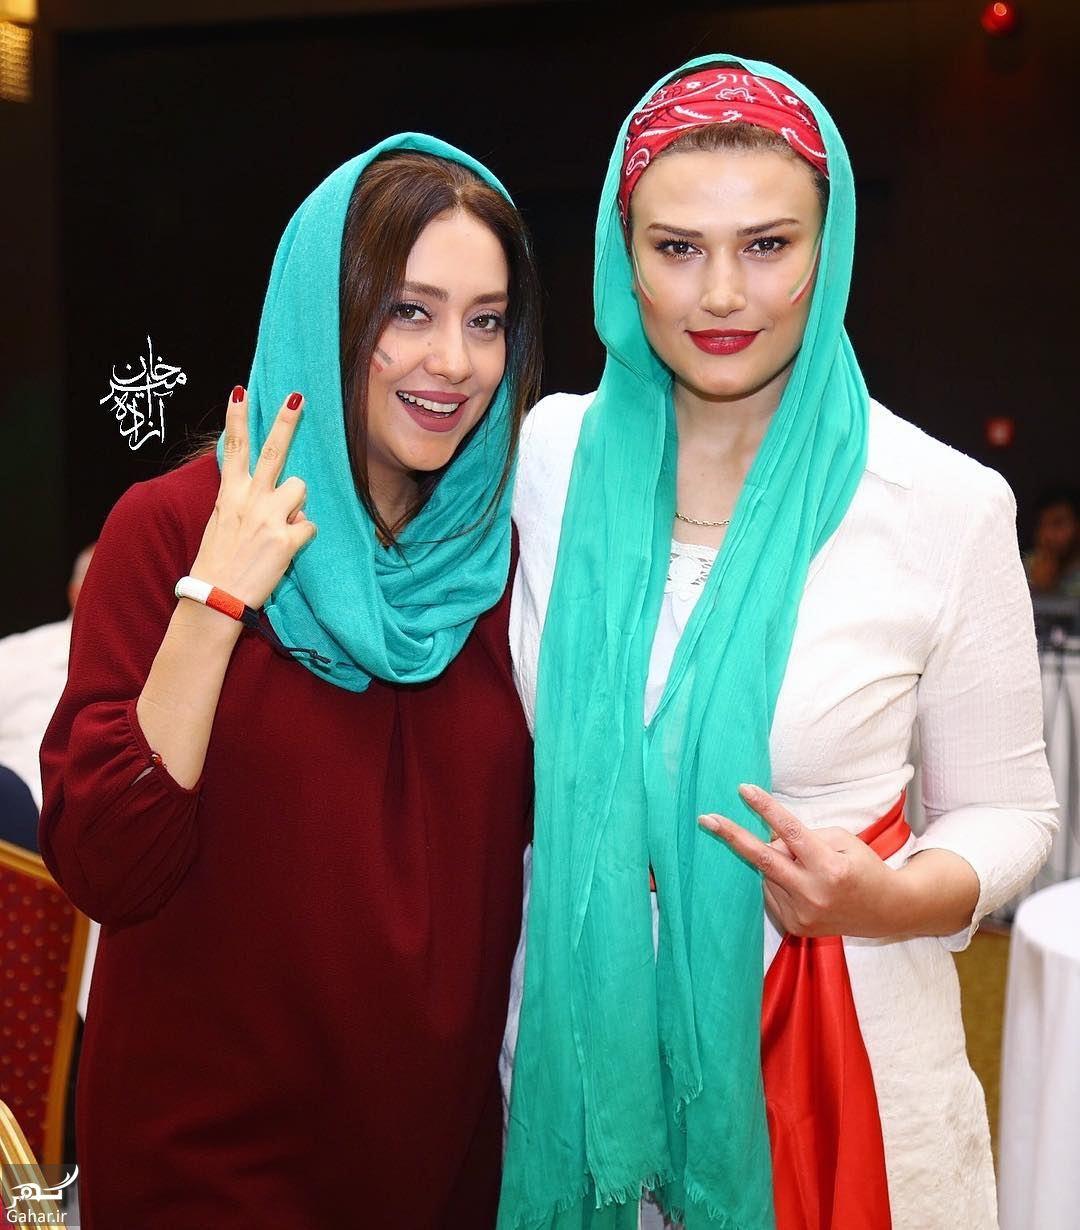 566954 Gahar ir مهمانی خصوصی بازیگران به مناسبت بازی ایران مراکش / تصاویر